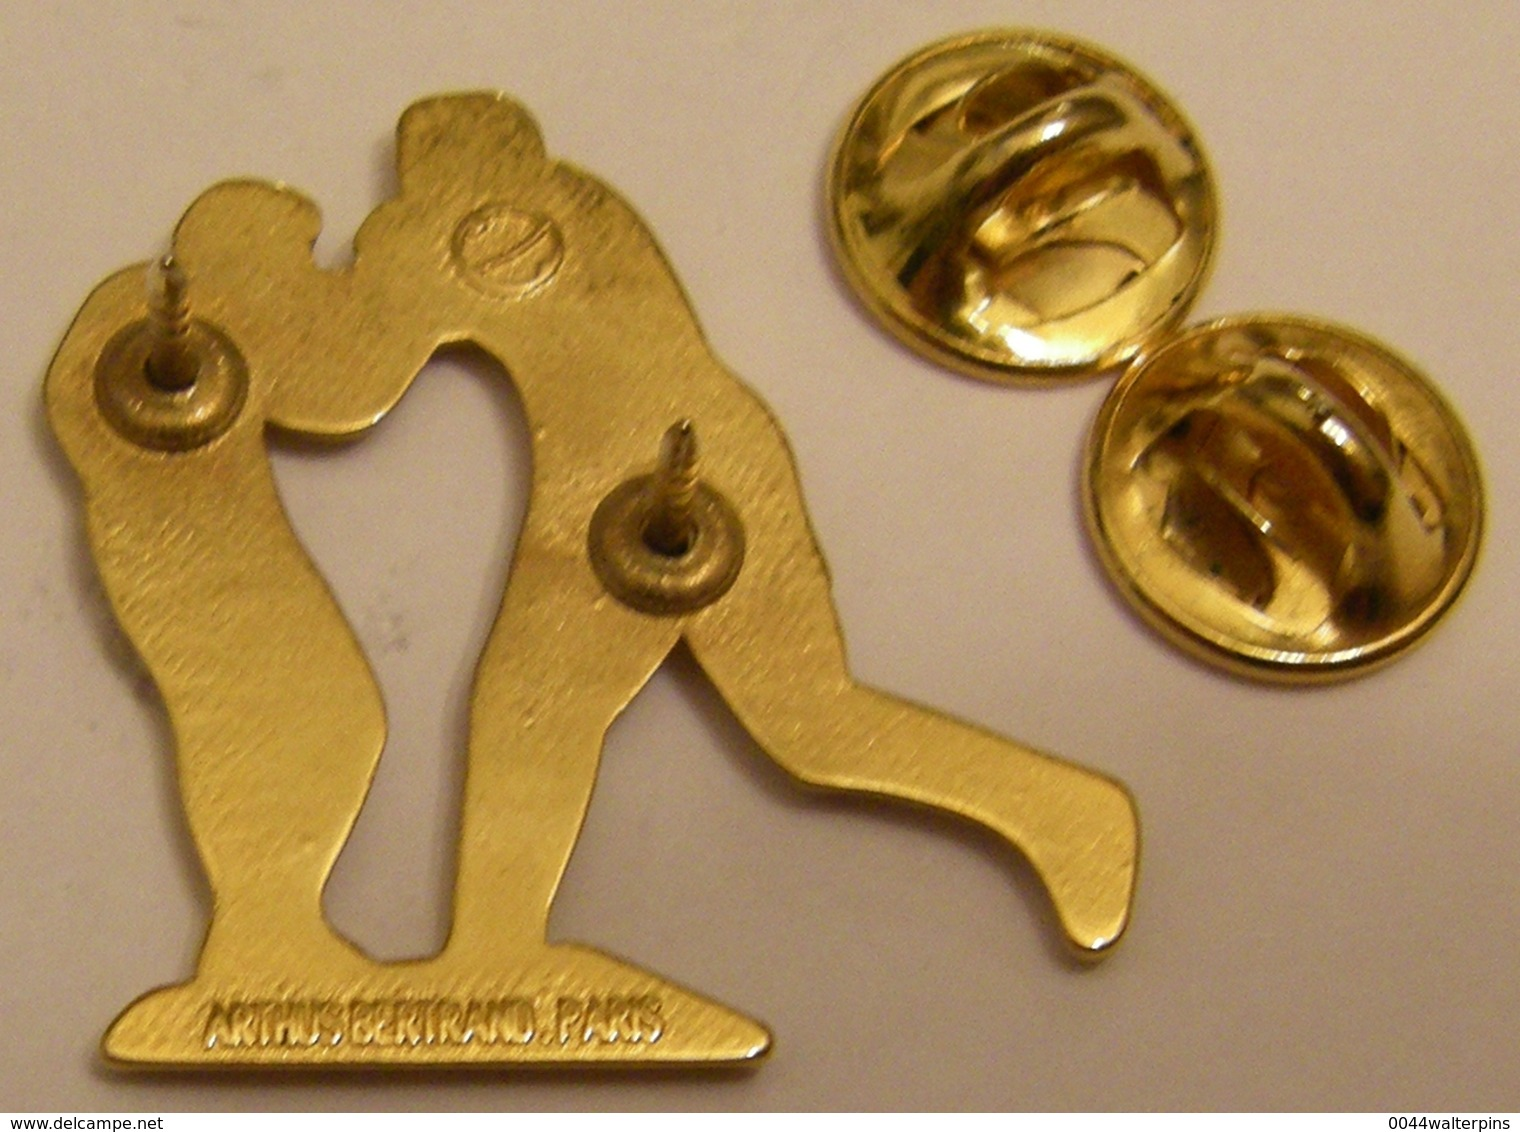 ARTHUS BERTRAND Série SPORTS BOXE Version JAUNE ROUGE Pin Pin's Pins - Arthus Bertrand